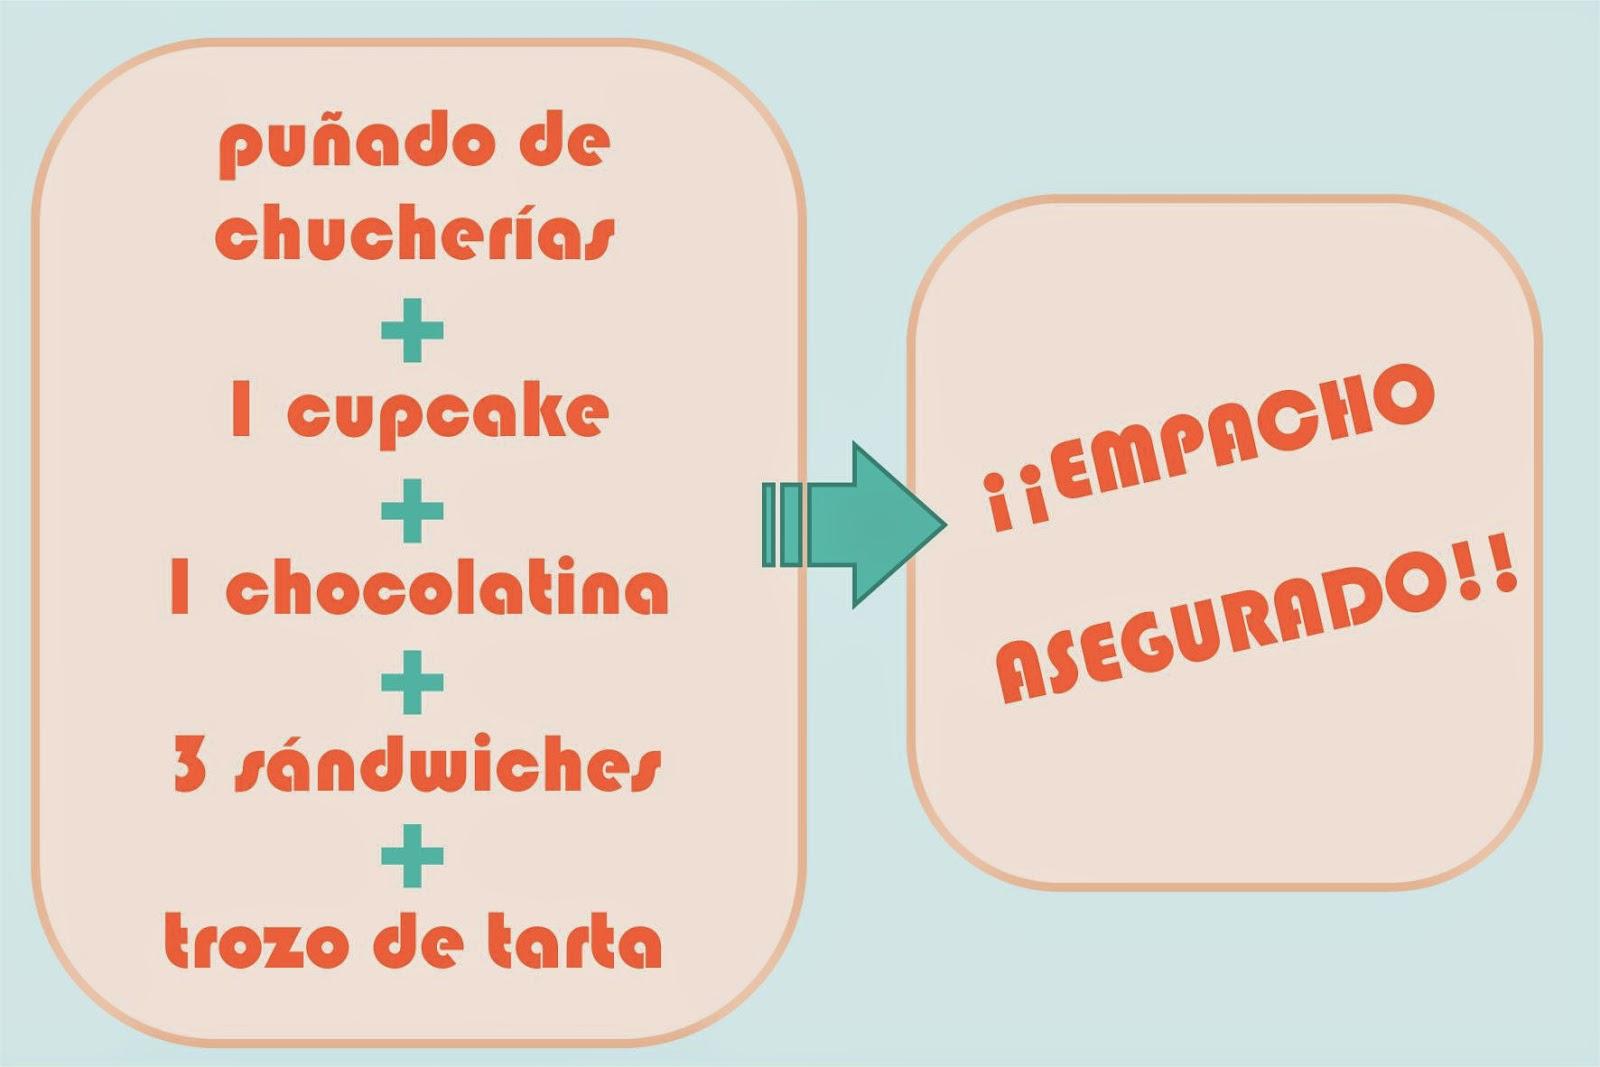 www.unafiestaperfecta.es - Empacho mesa dulce